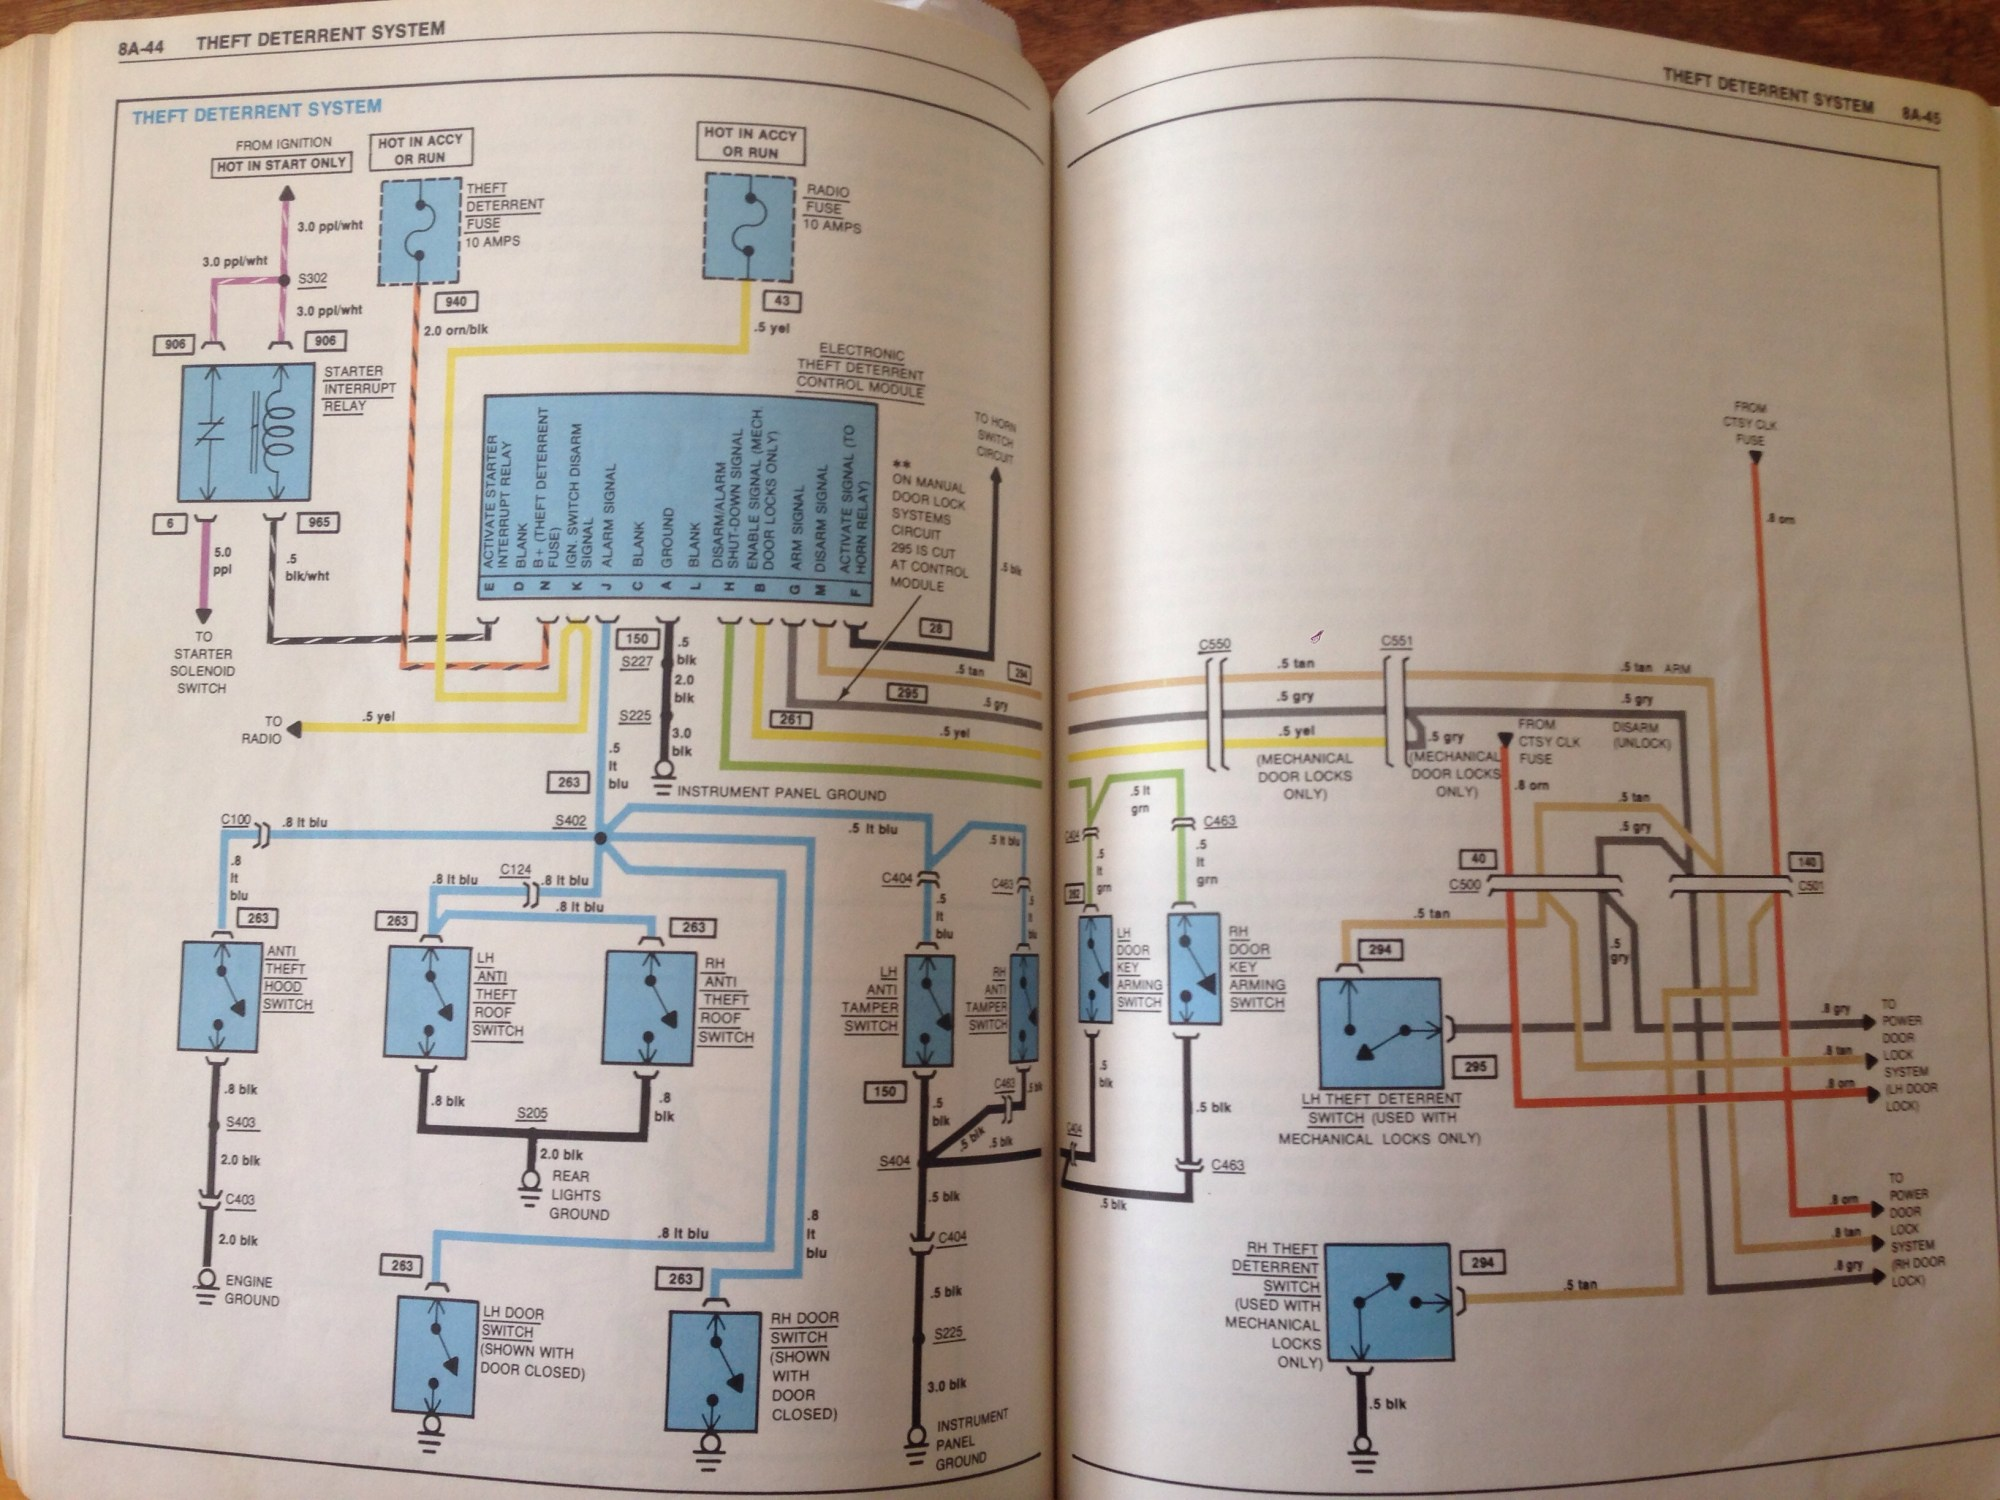 hight resolution of viper alarm wiring diagram wiring diagram and schematic design viper 350 3105v 1 way car alarm